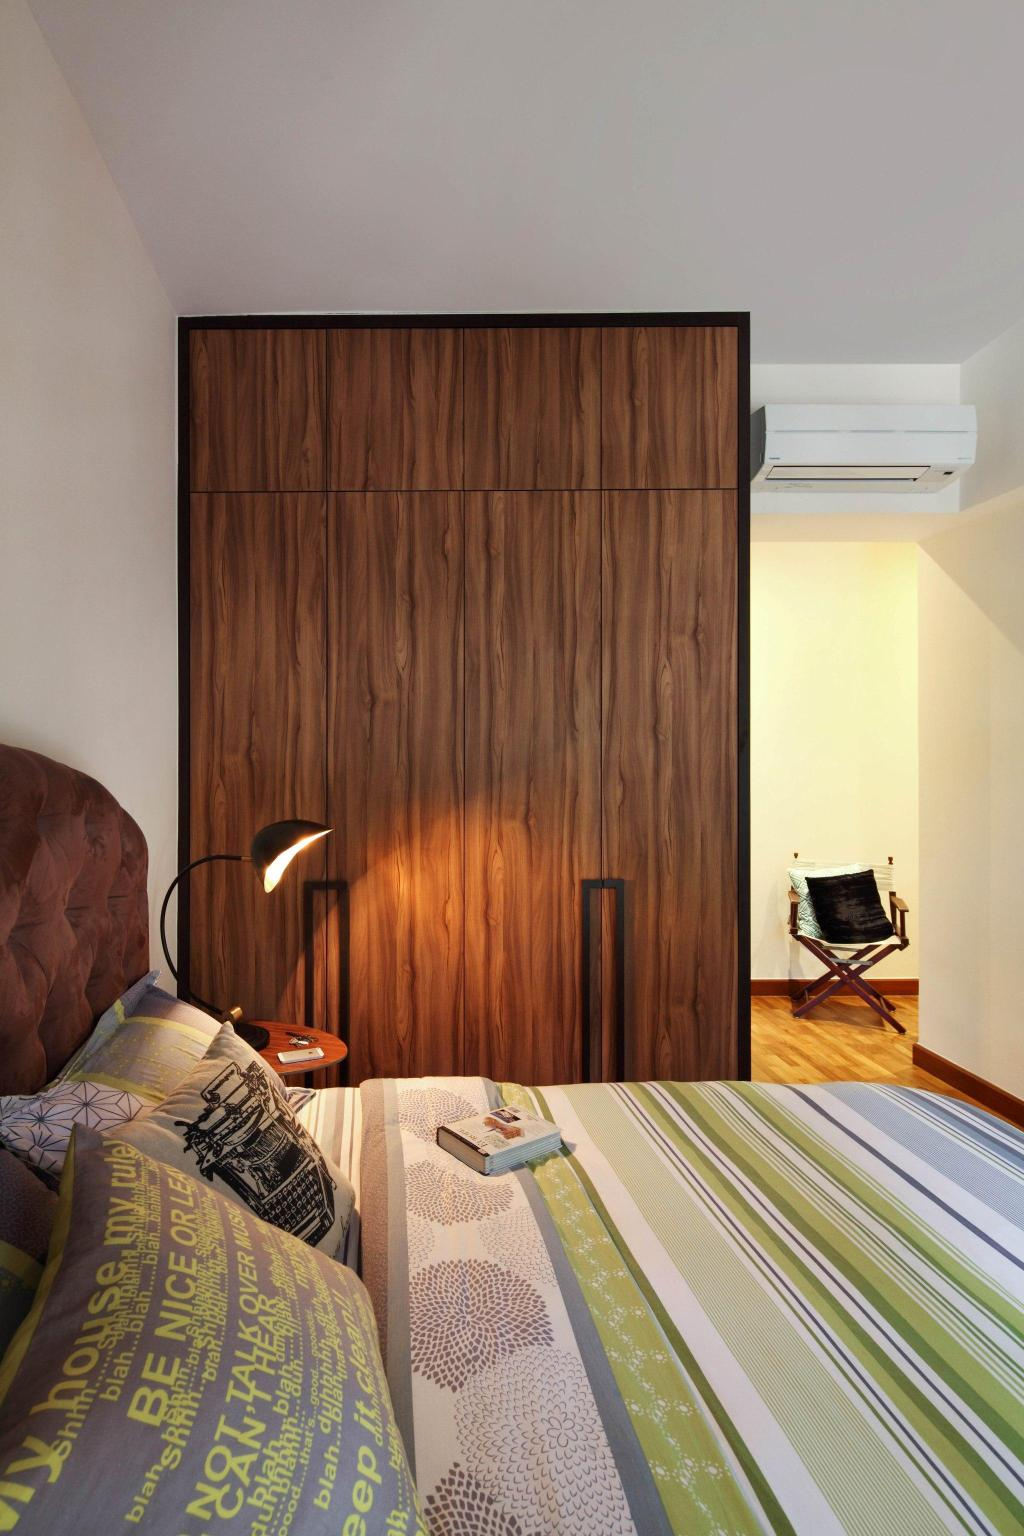 Transitional, Condo, Bedroom, Casafina, Interior Designer, Fuse Concept, Lamp, Quilted Headboard, Tufted Headboard, Headboard, Closet, Wardrobe, Parquet, Chair, Warm Tones